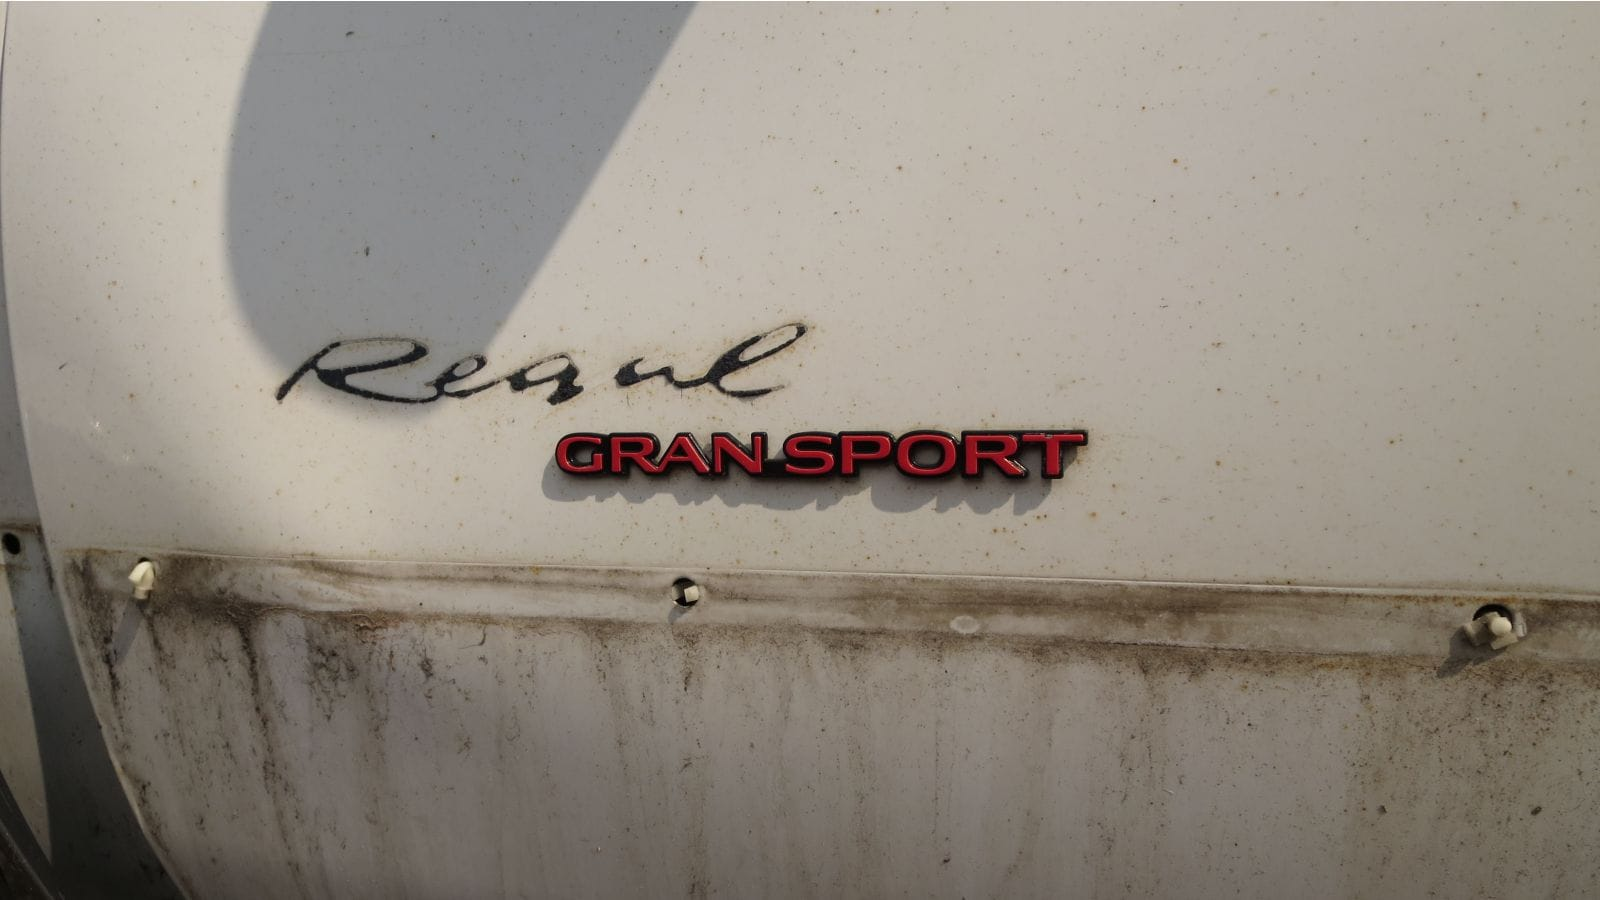 Junked 1995 Buick Regal Gran Sport